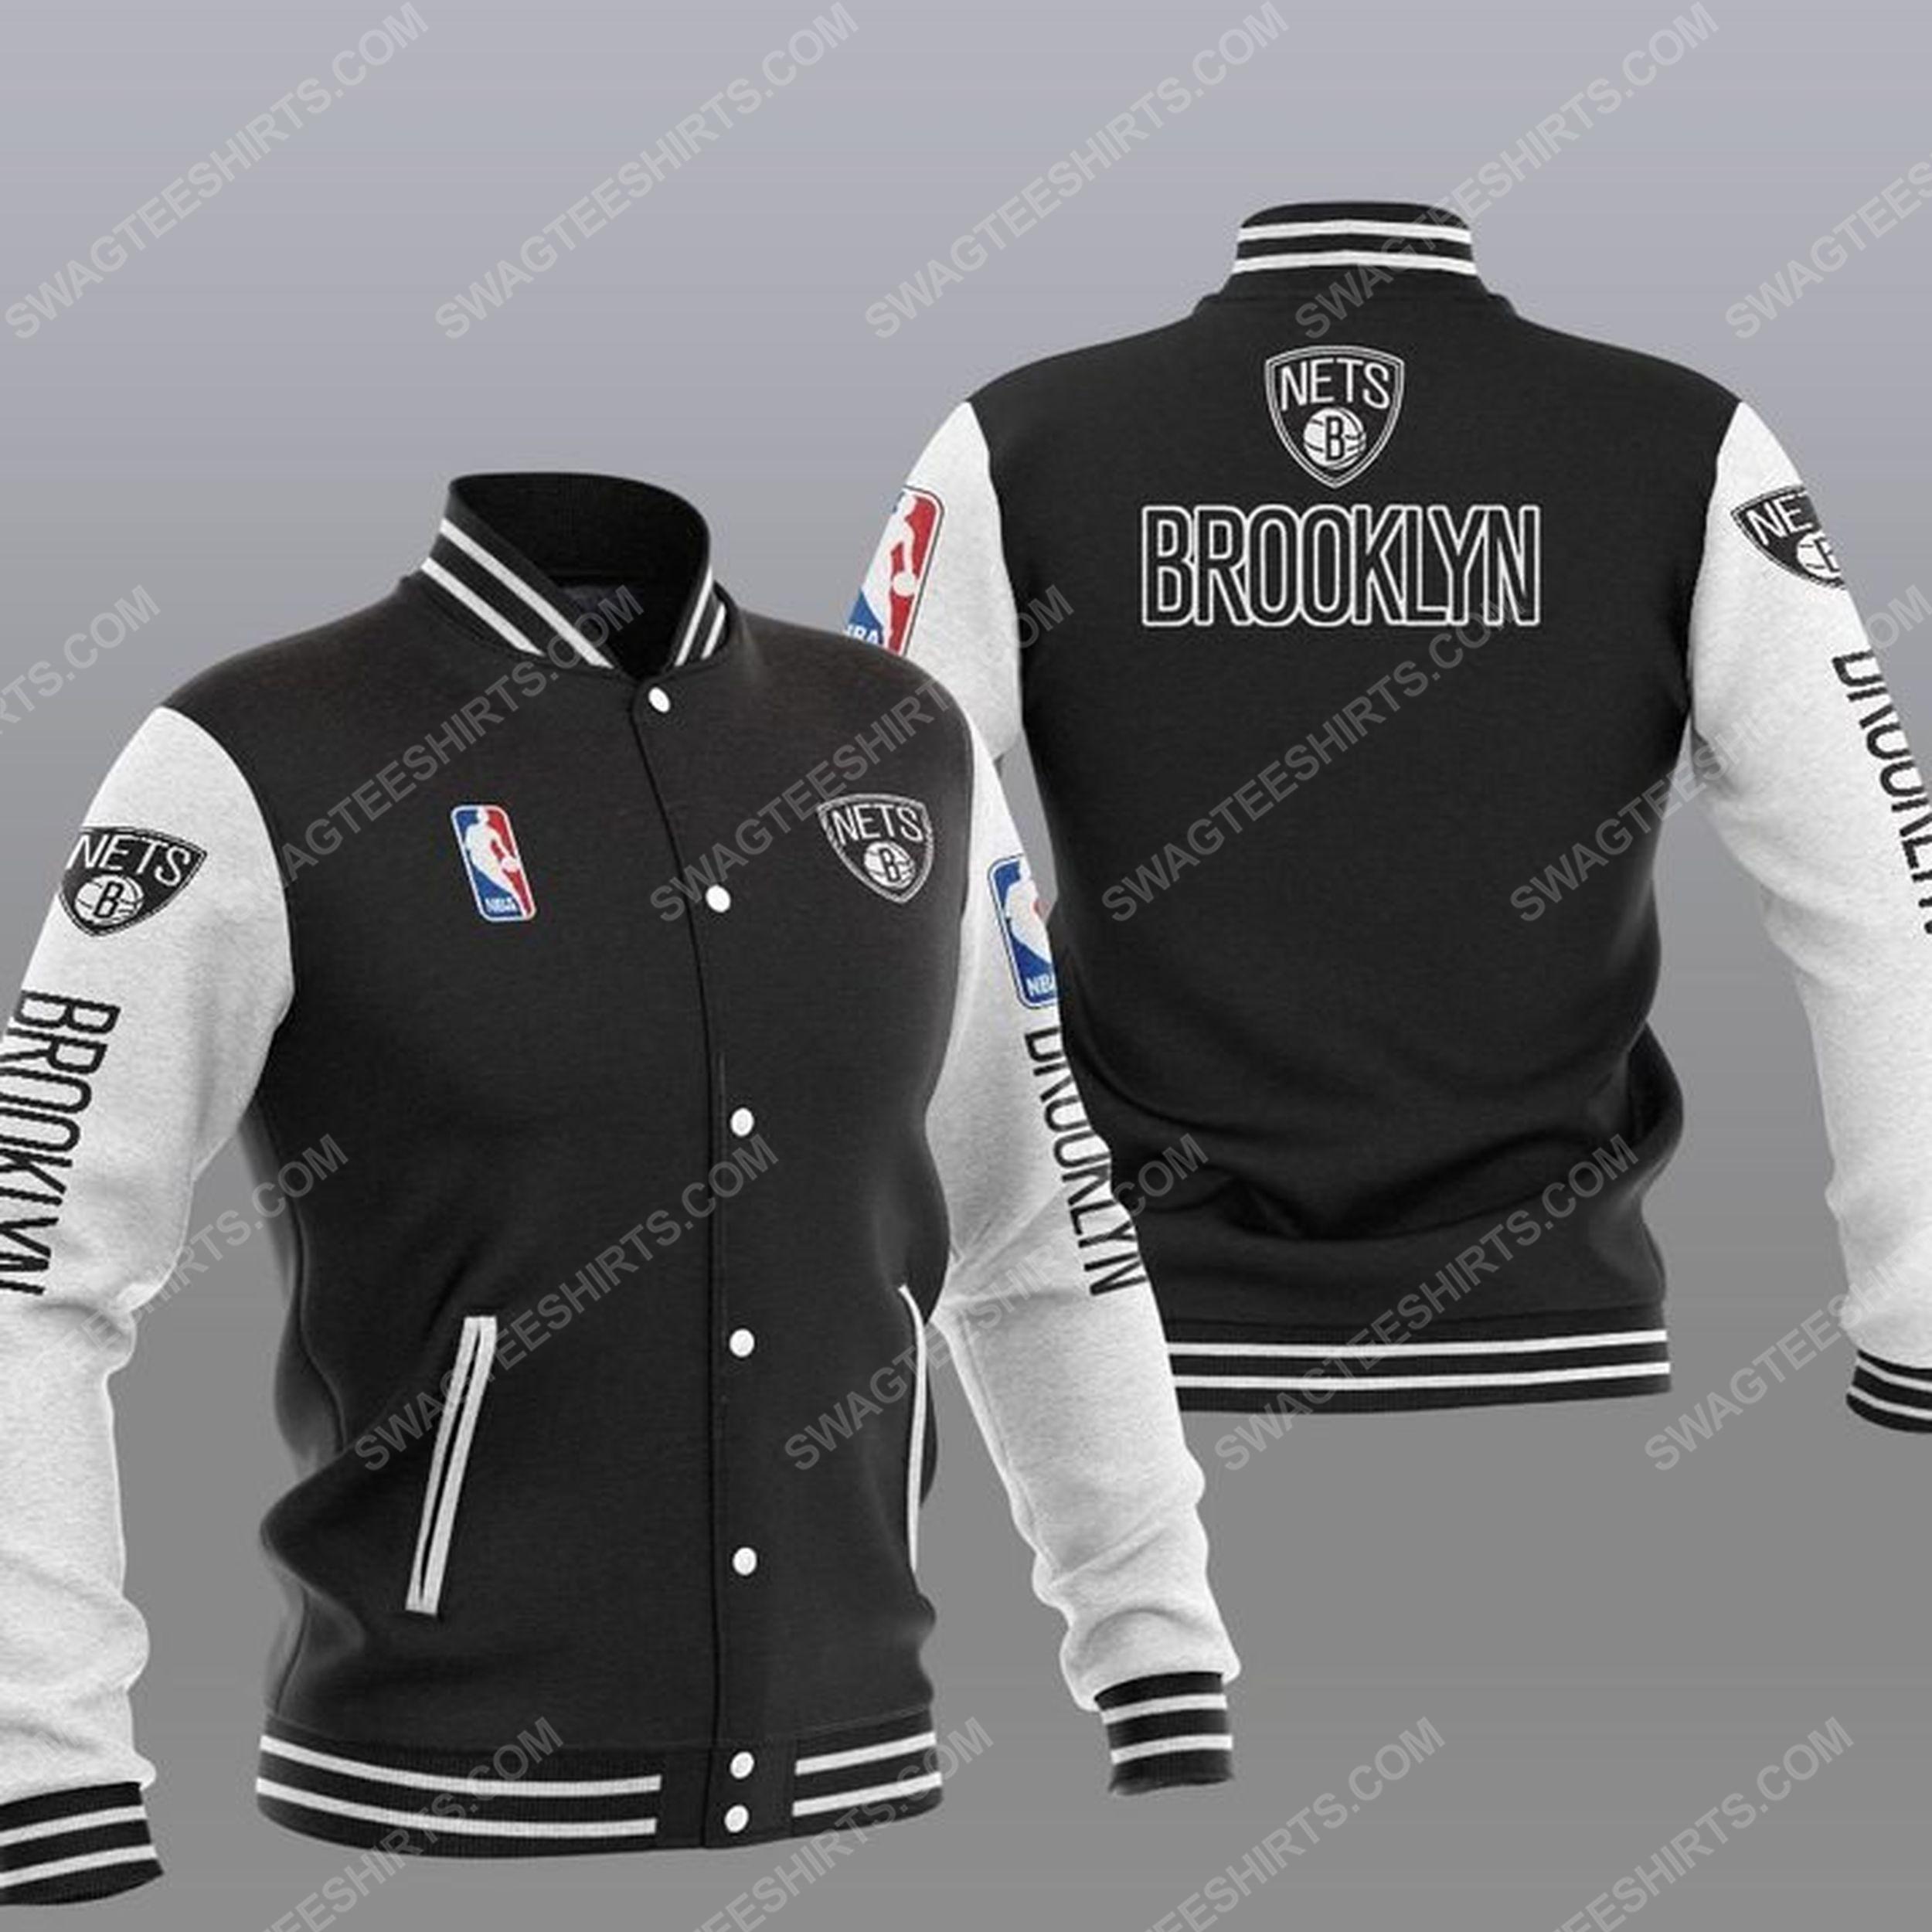 The brooklyn nets nba all over print baseball jacket - black 1